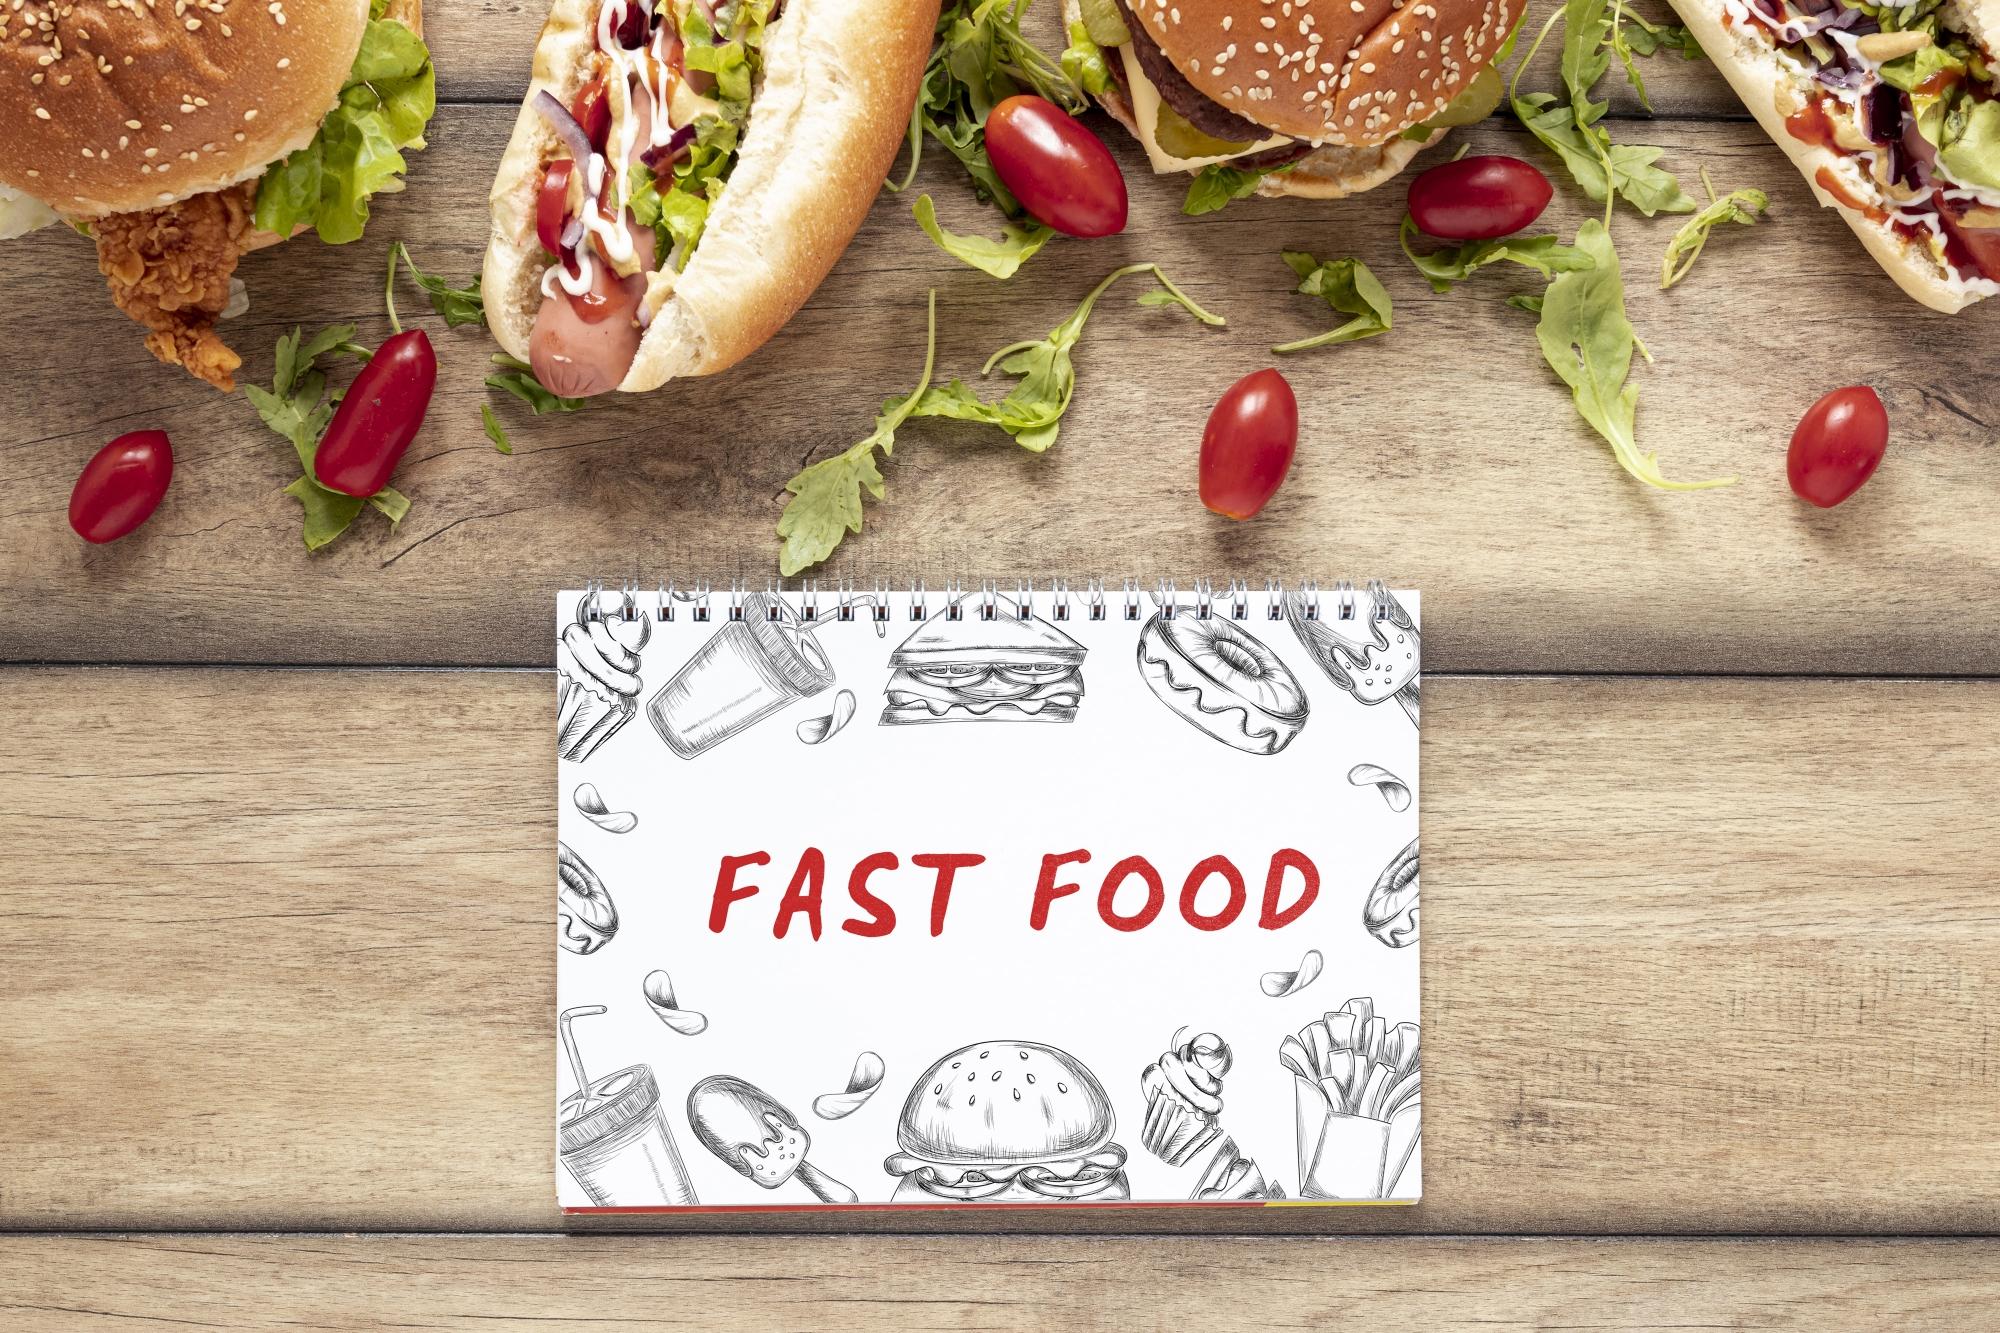 Kebab, Falafel, Sallad och pommes - Onlinekiosken.se